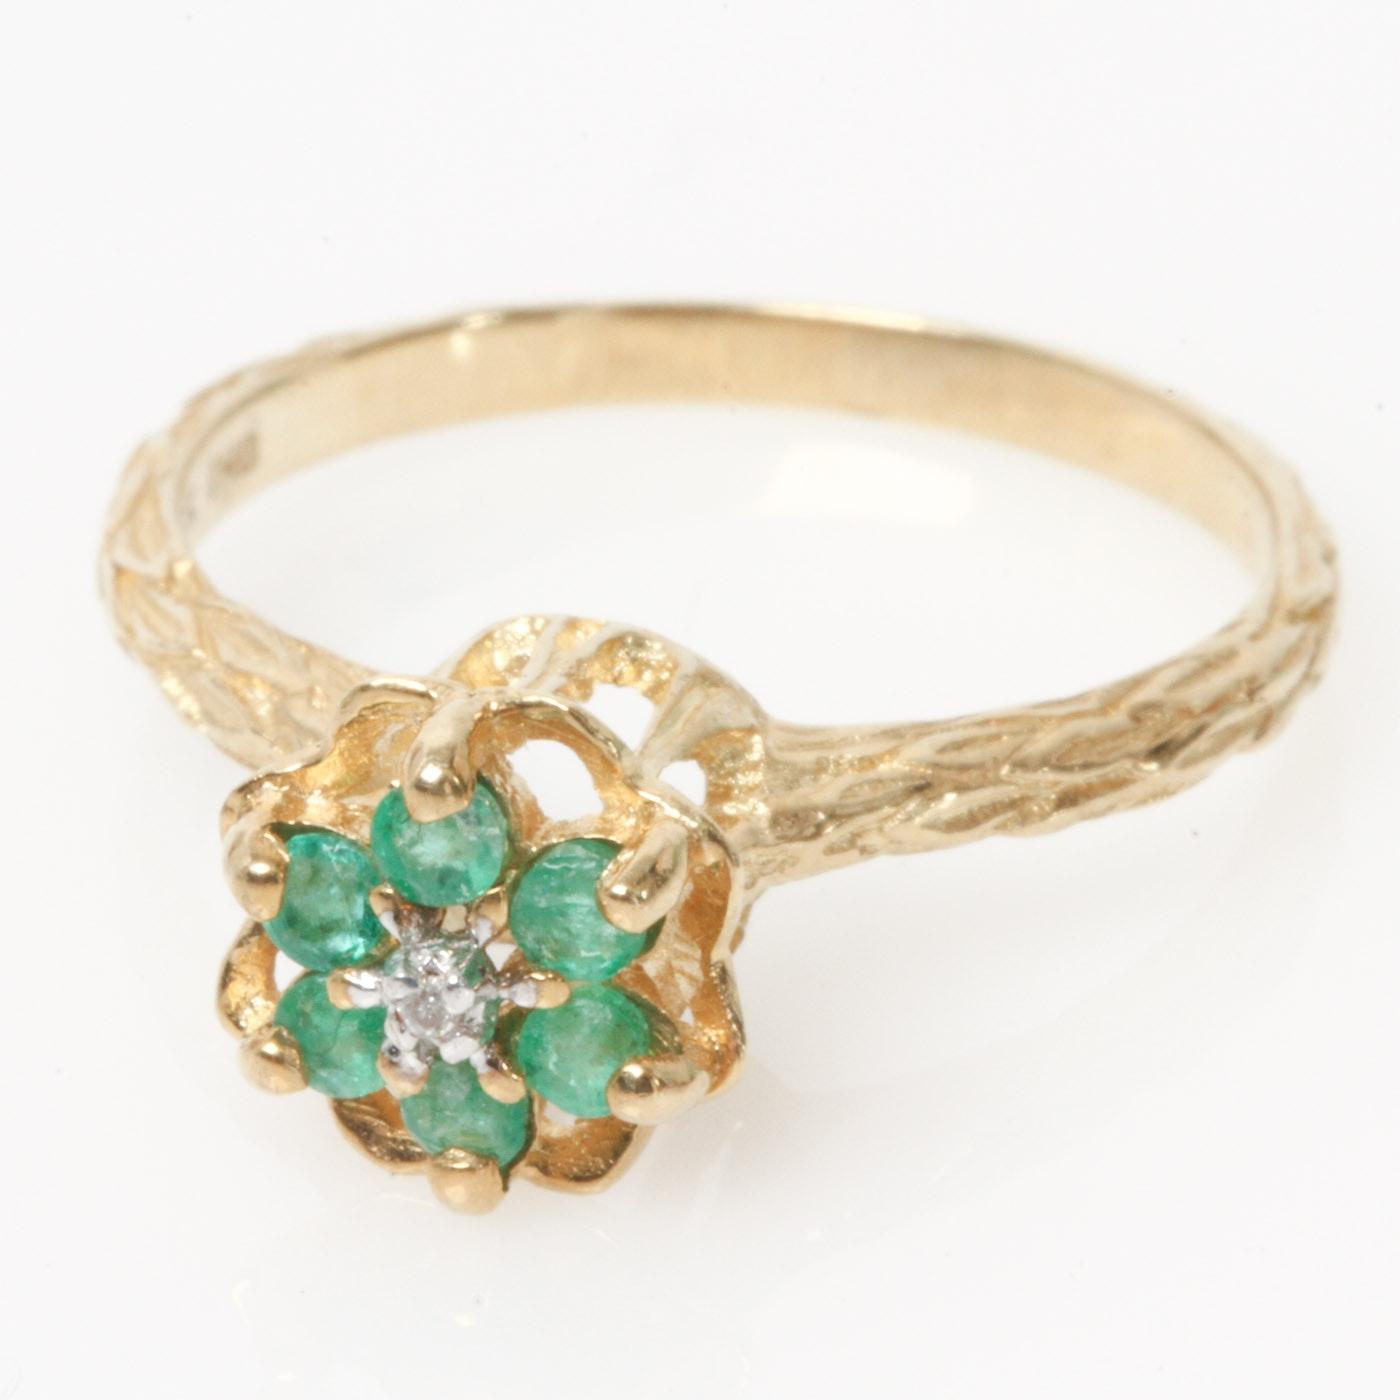 Samuel Aaron Retro 10K Yellow Gold High Set Emerald and Diamond Ring